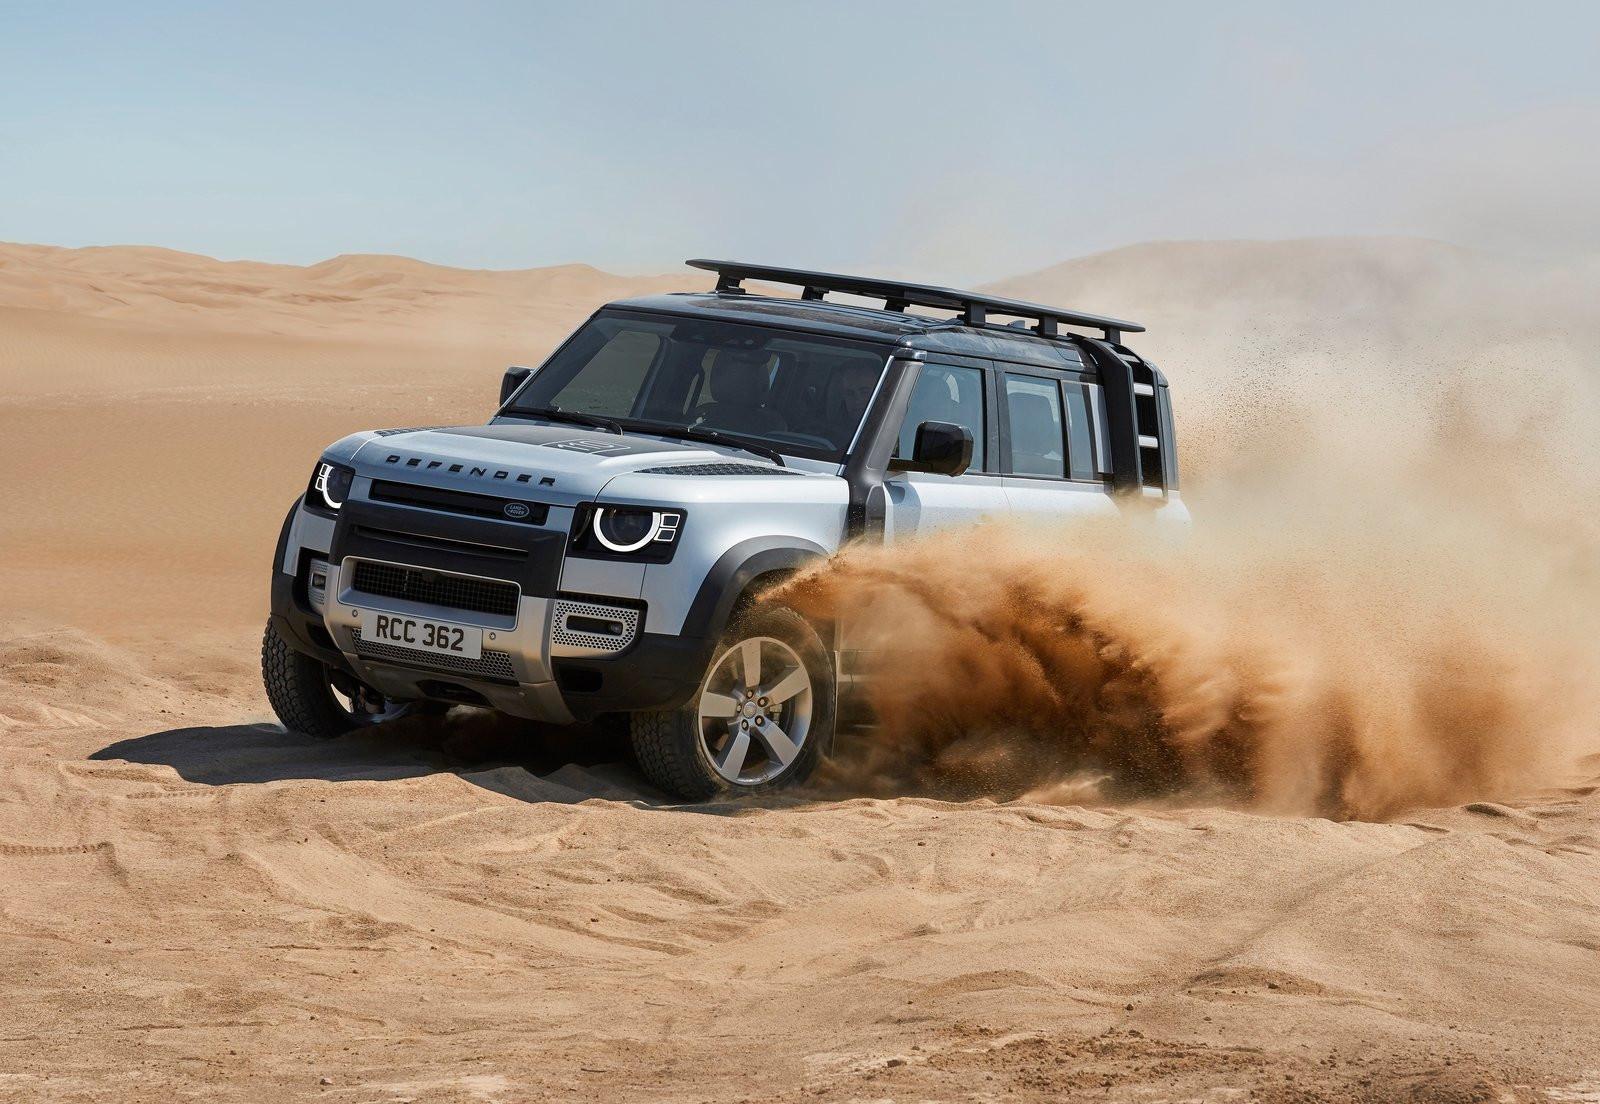 Land Rover Defender mantiene su espíritu aventurero